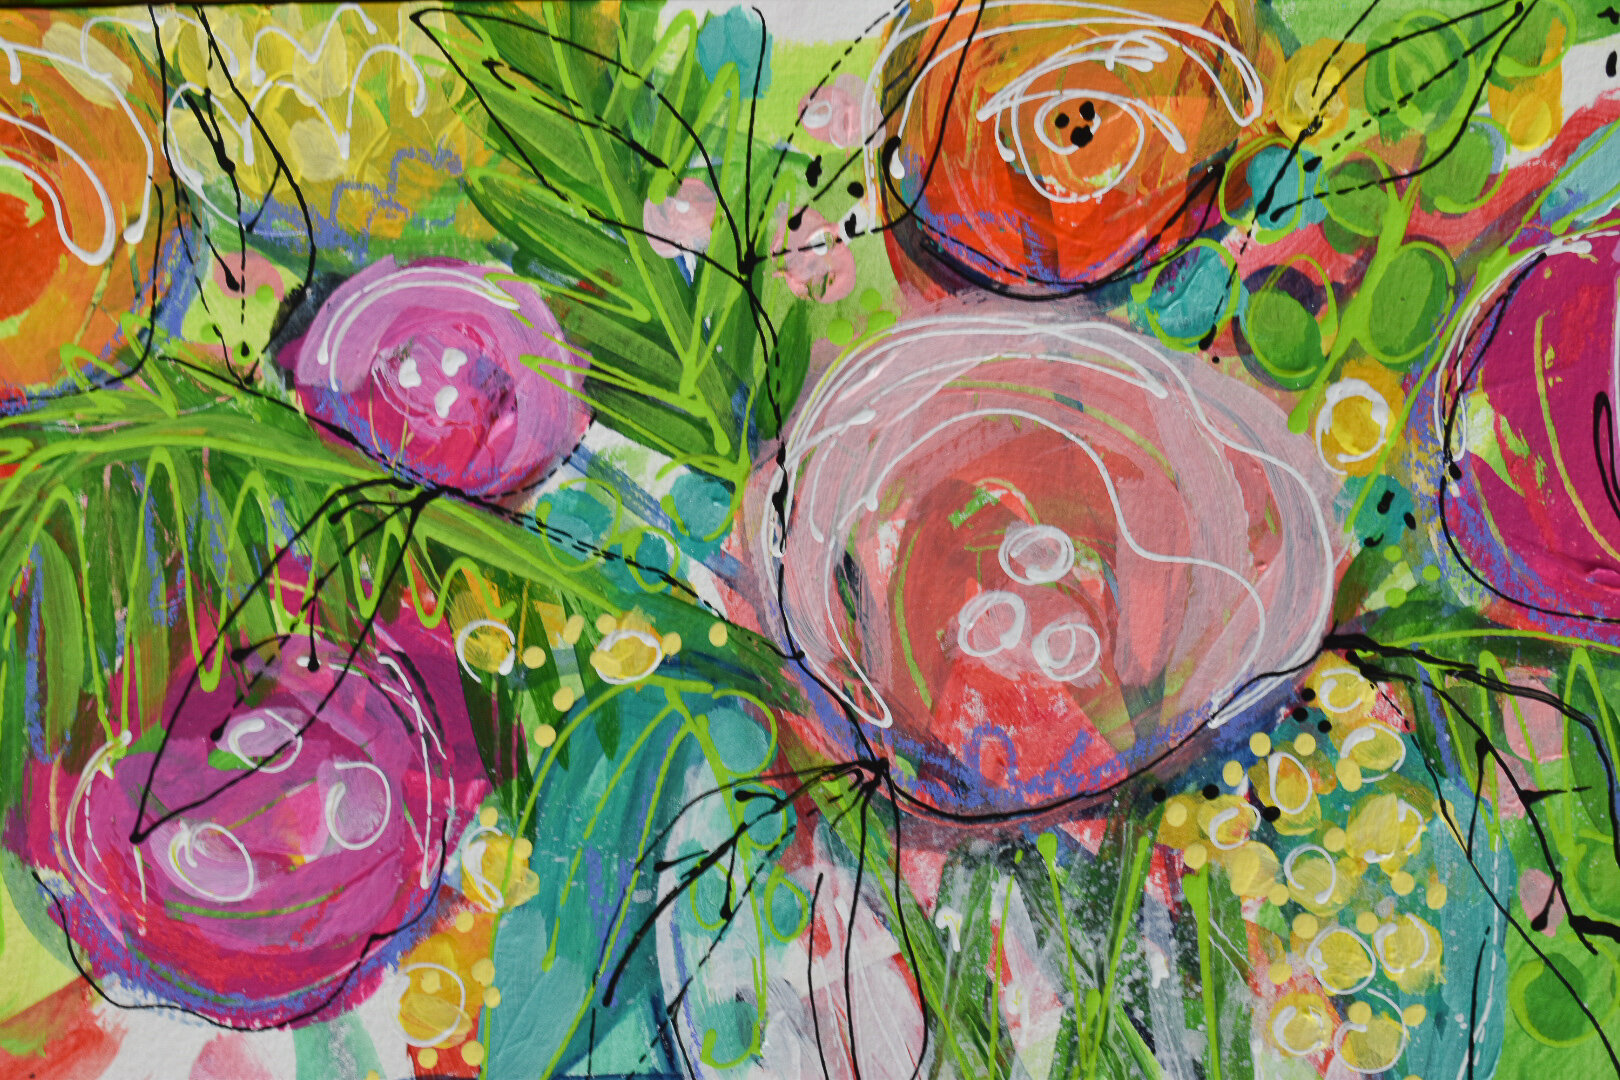 boho_tropical_flowers_citrus_daisyfaithart_6.jpg